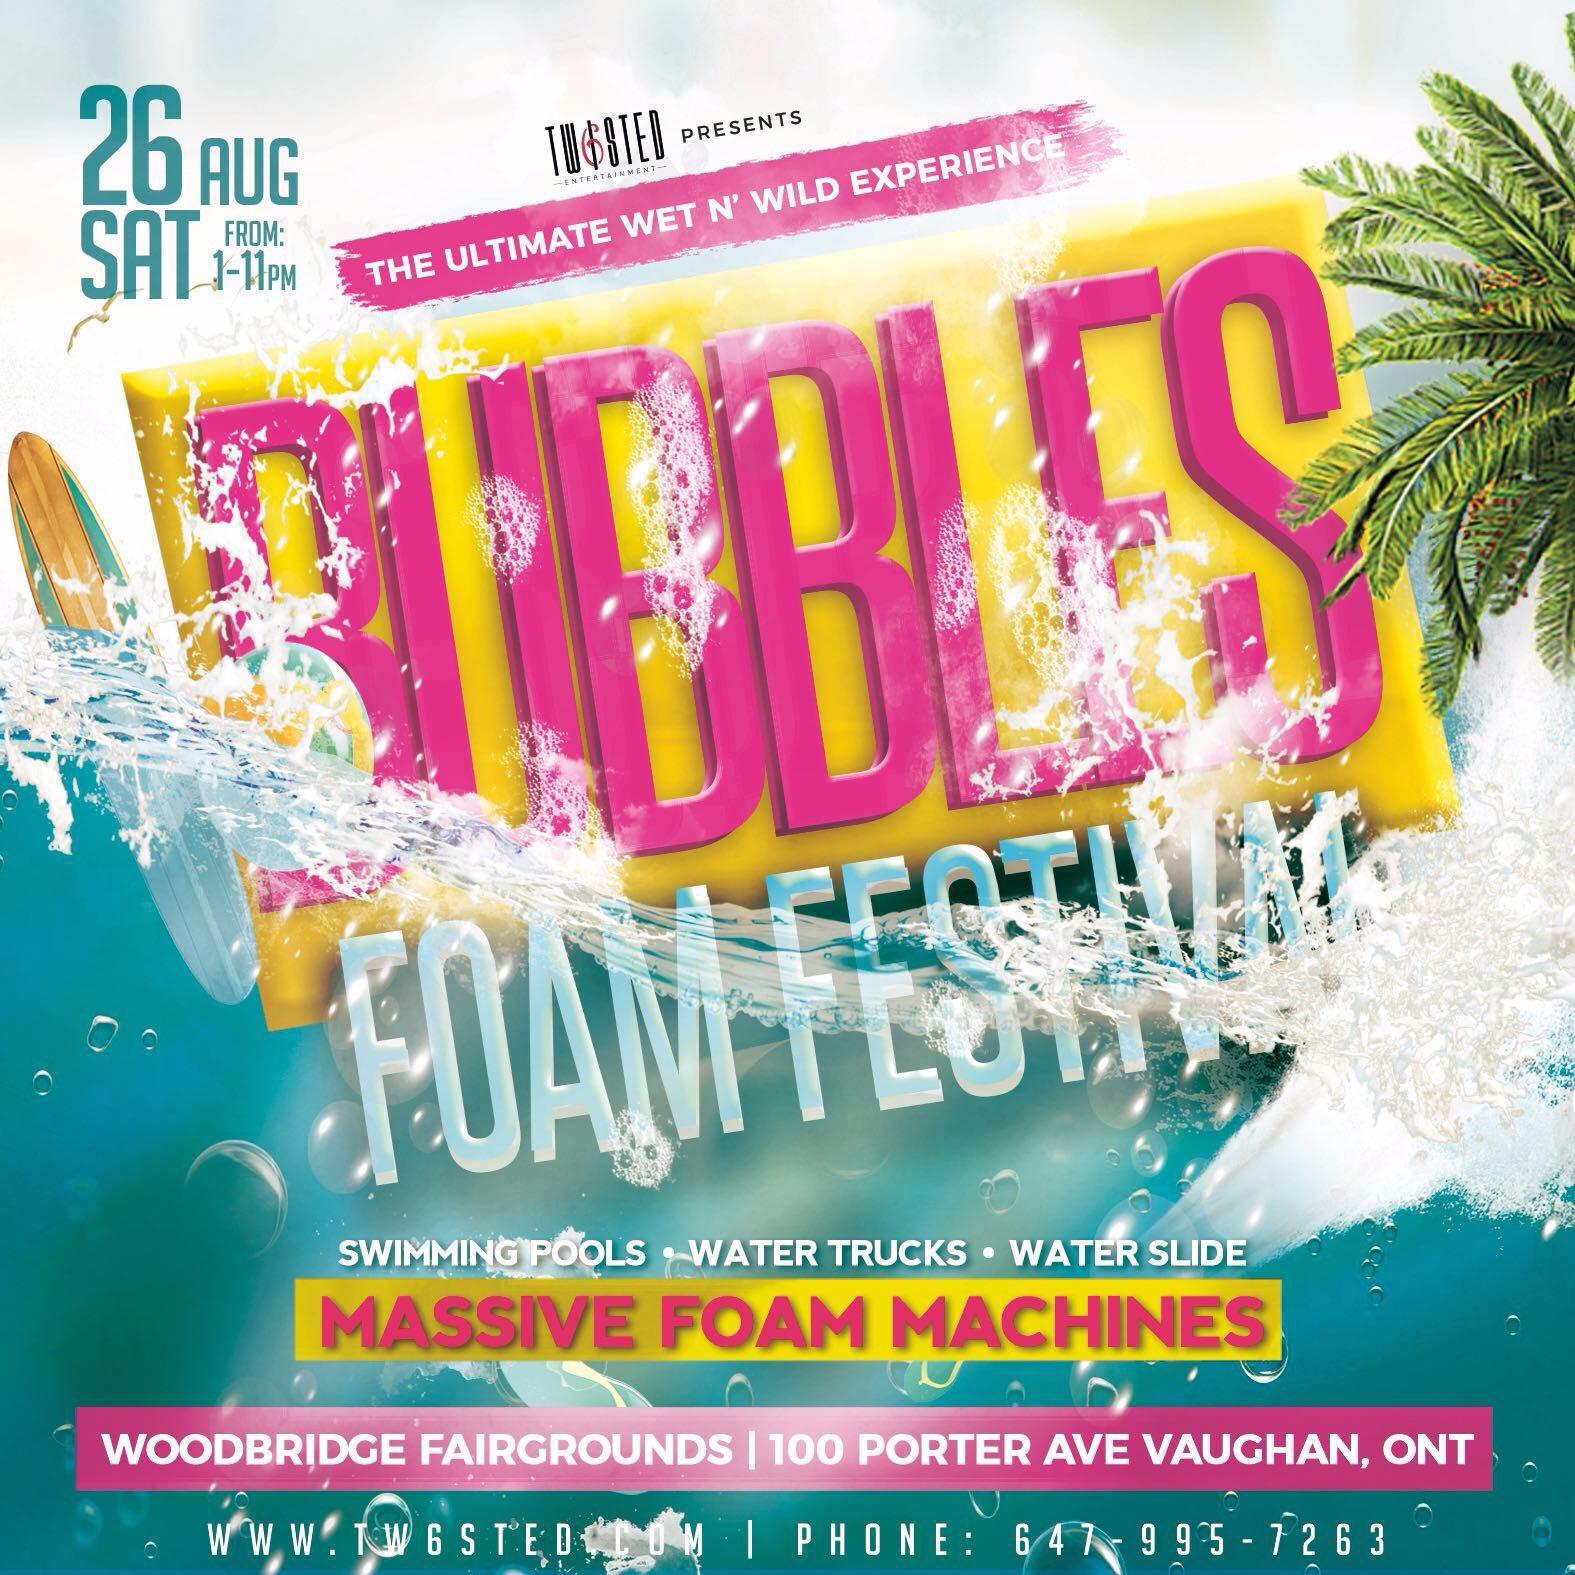 Bubbles Foam Festival | The Ultimate WET N' WILD Urban Experience |